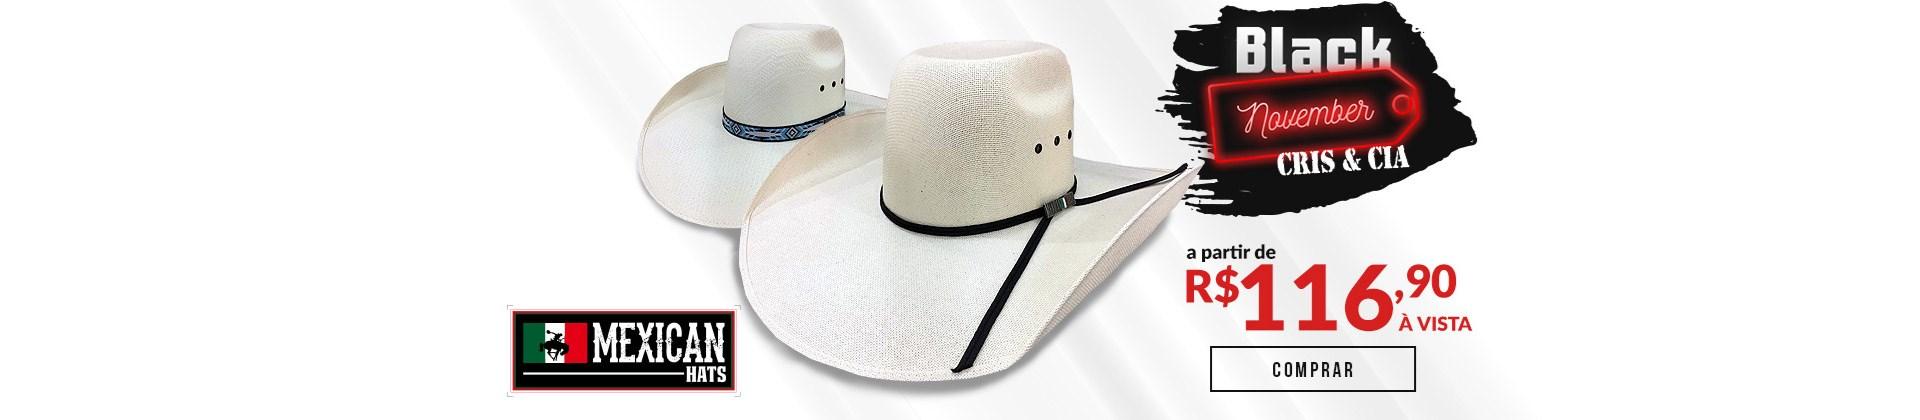 Loredo Mexican Hats - Black November 01